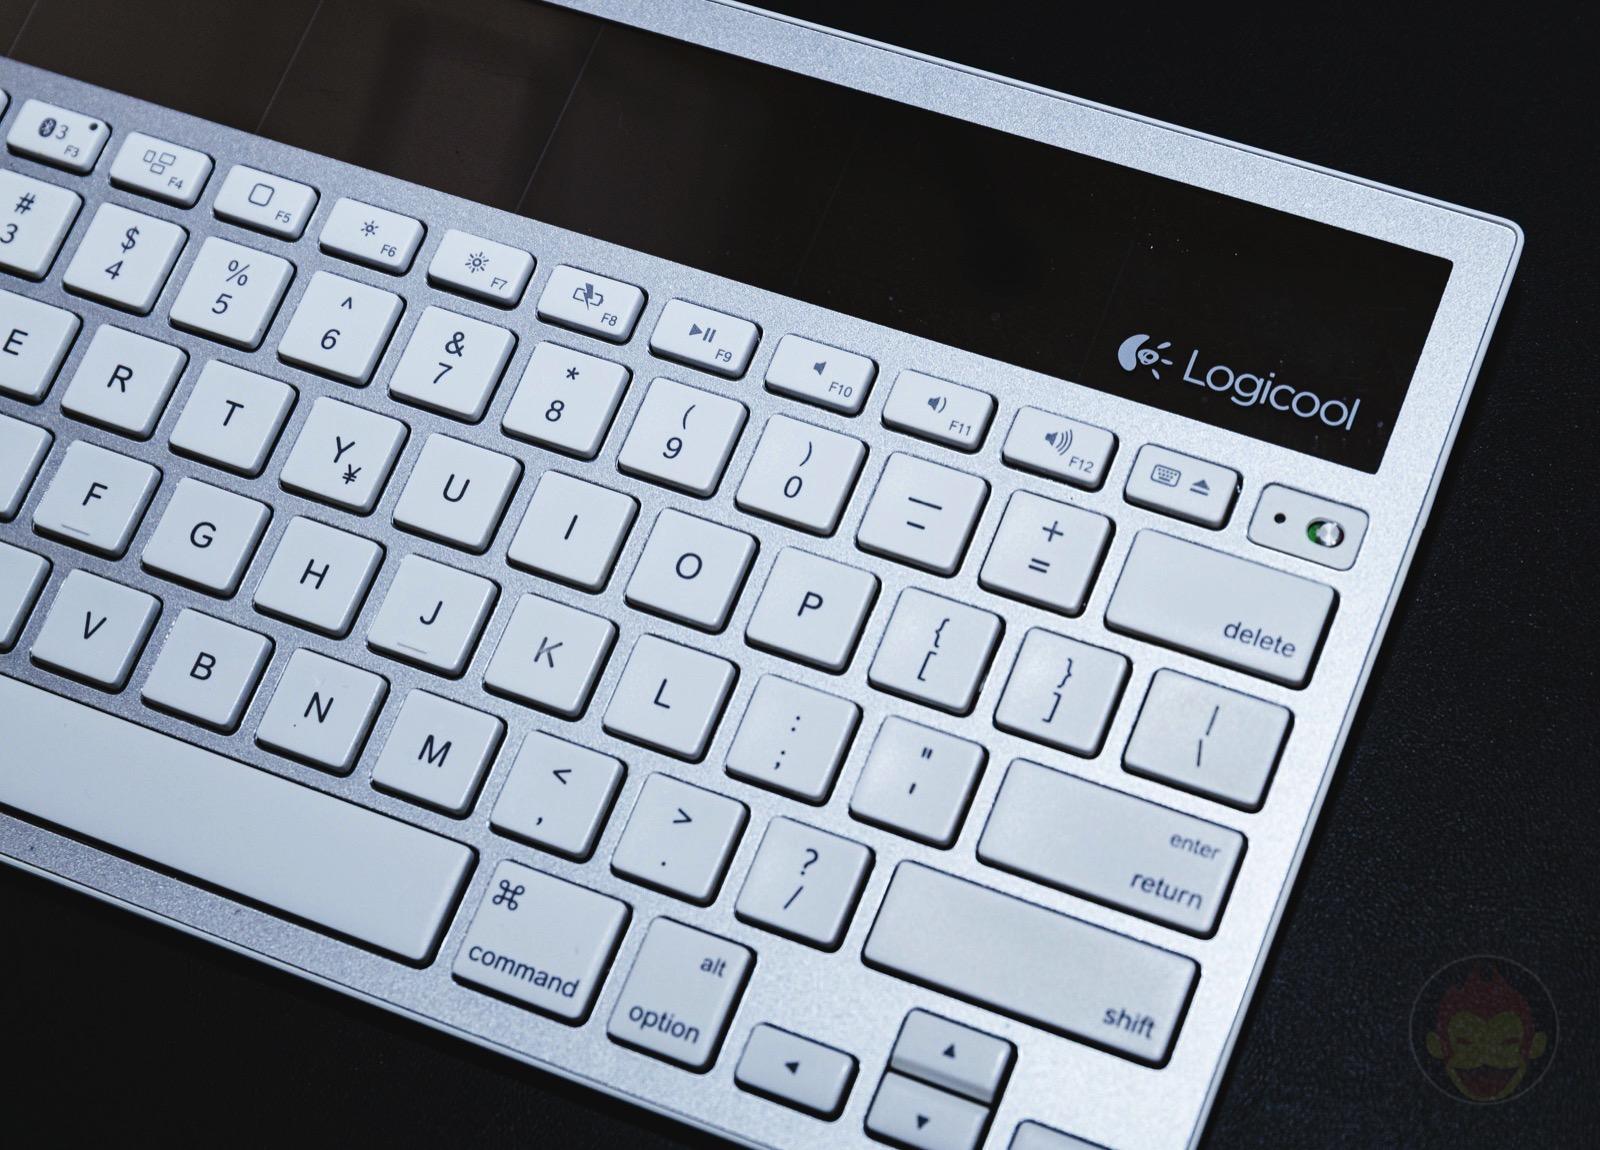 Logicool-Solar-Keyboard-k760-02.jpg